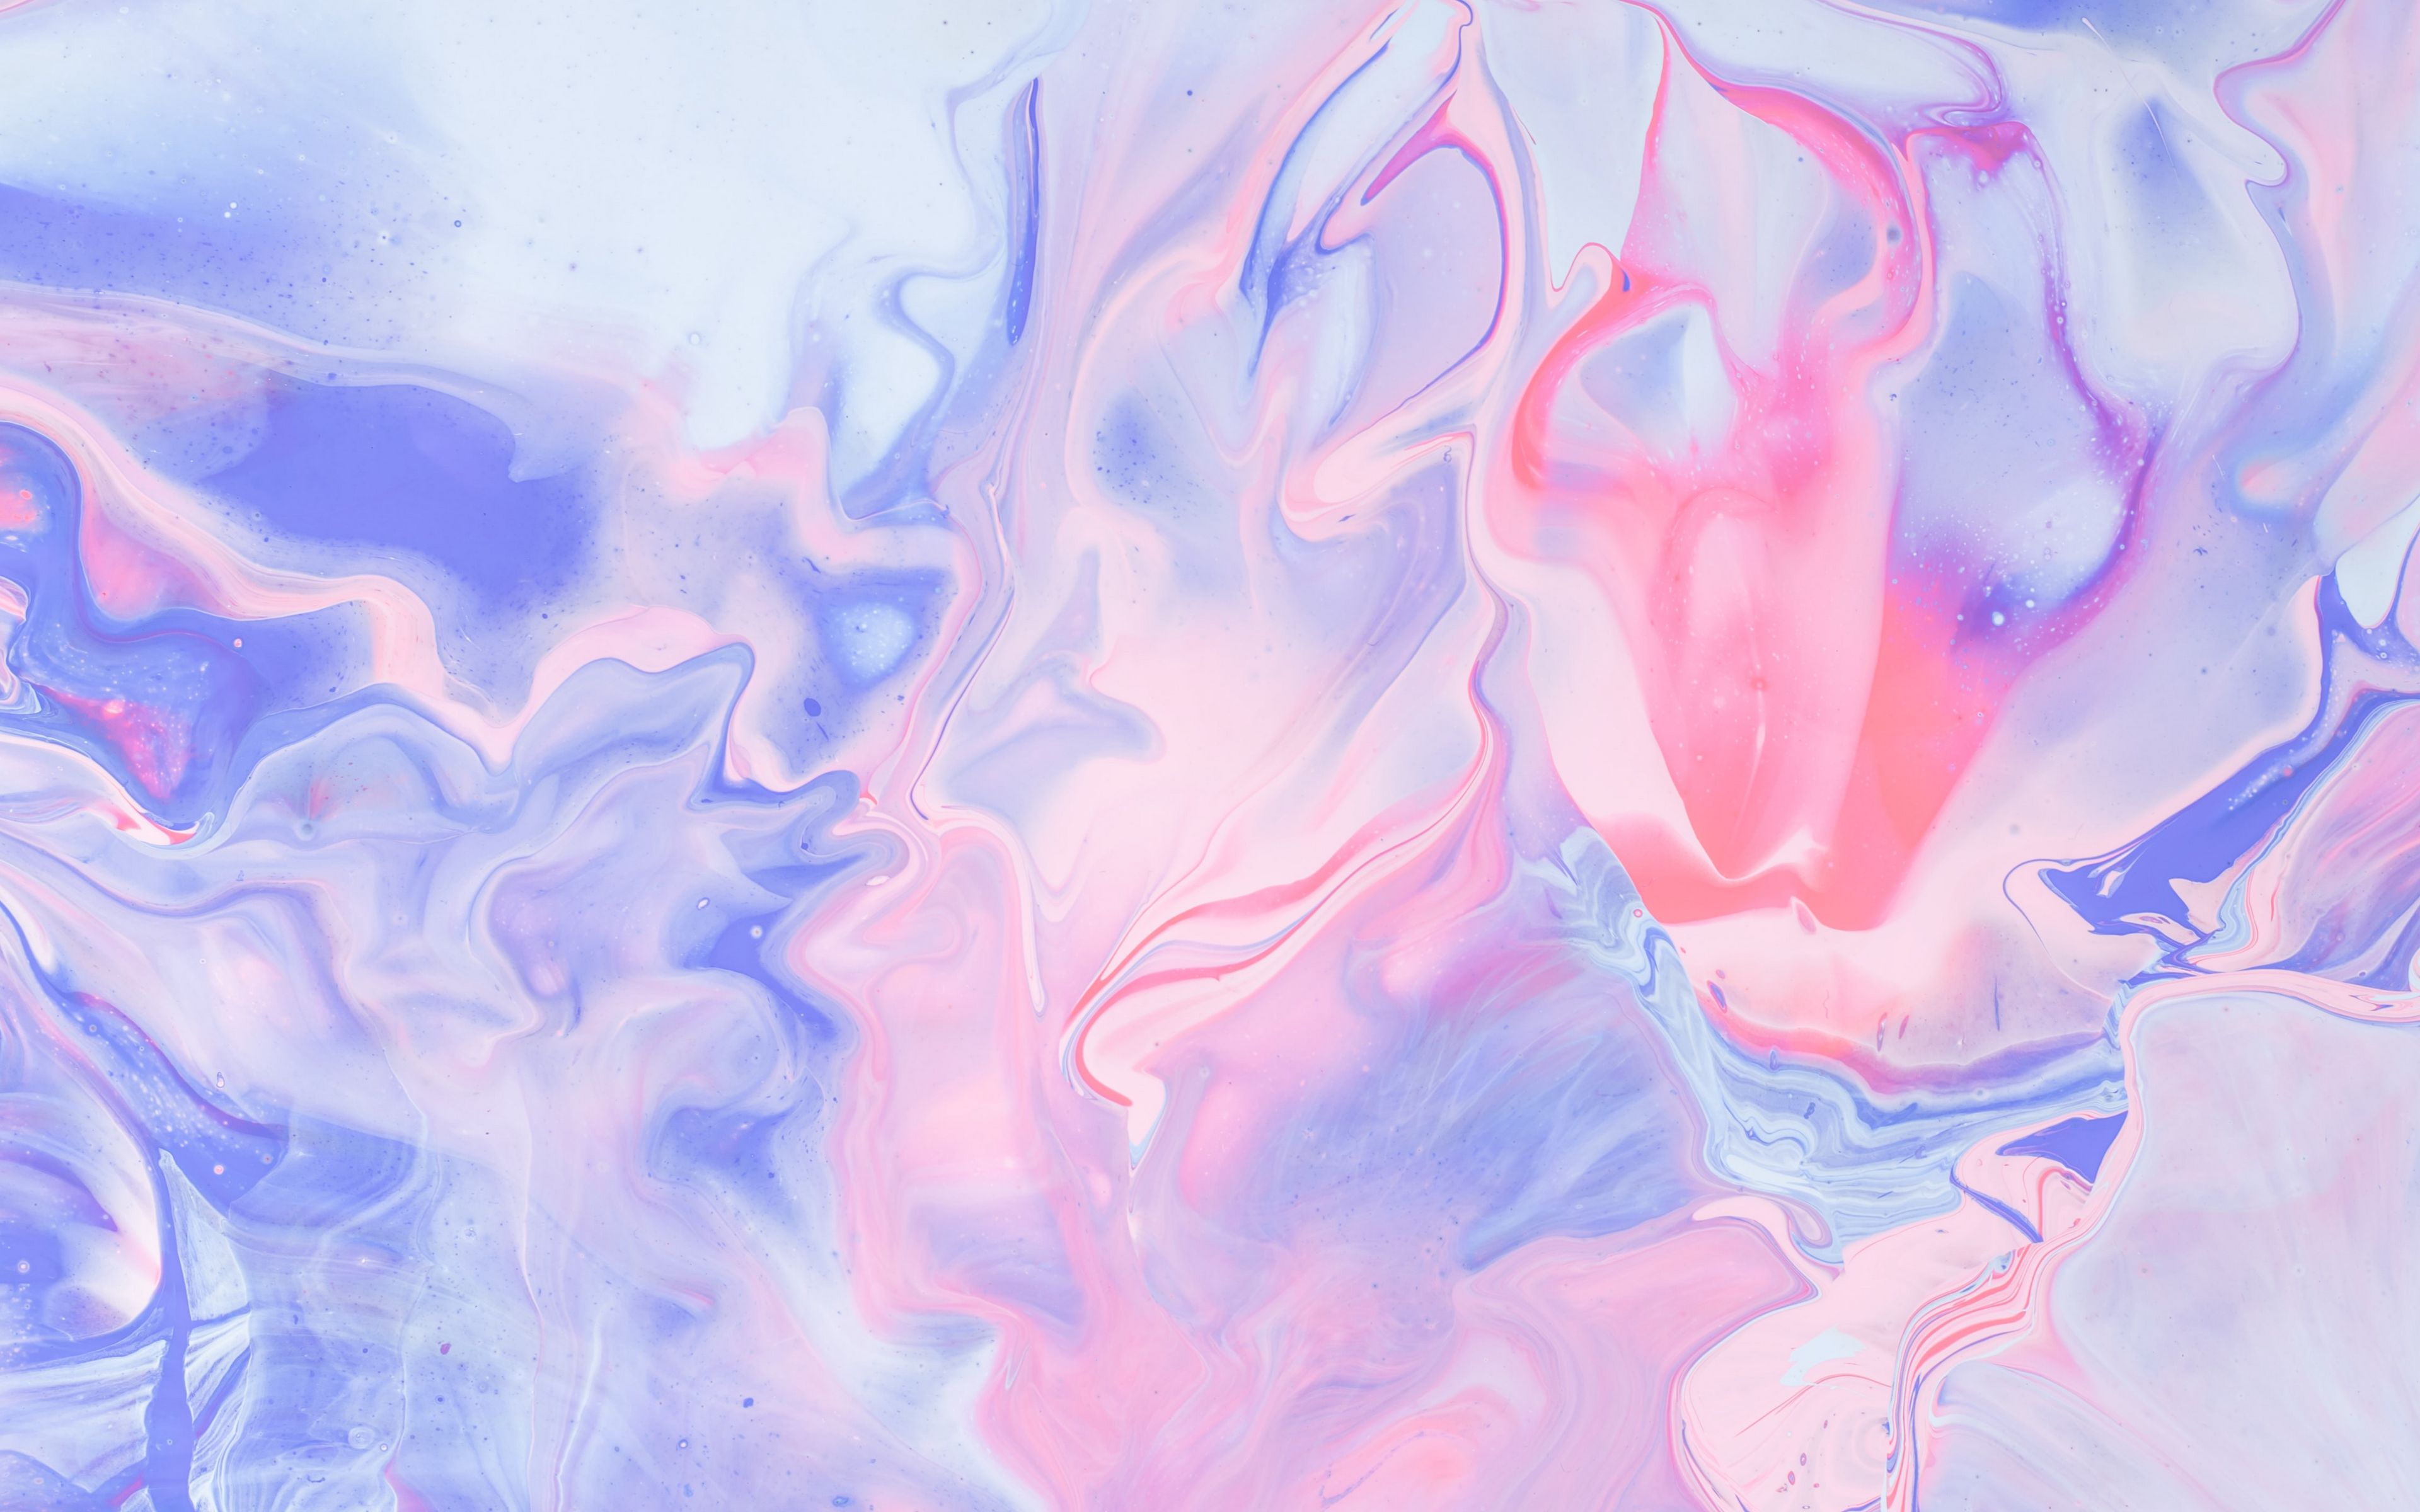 Wallpaper Liquid paint pink and purple